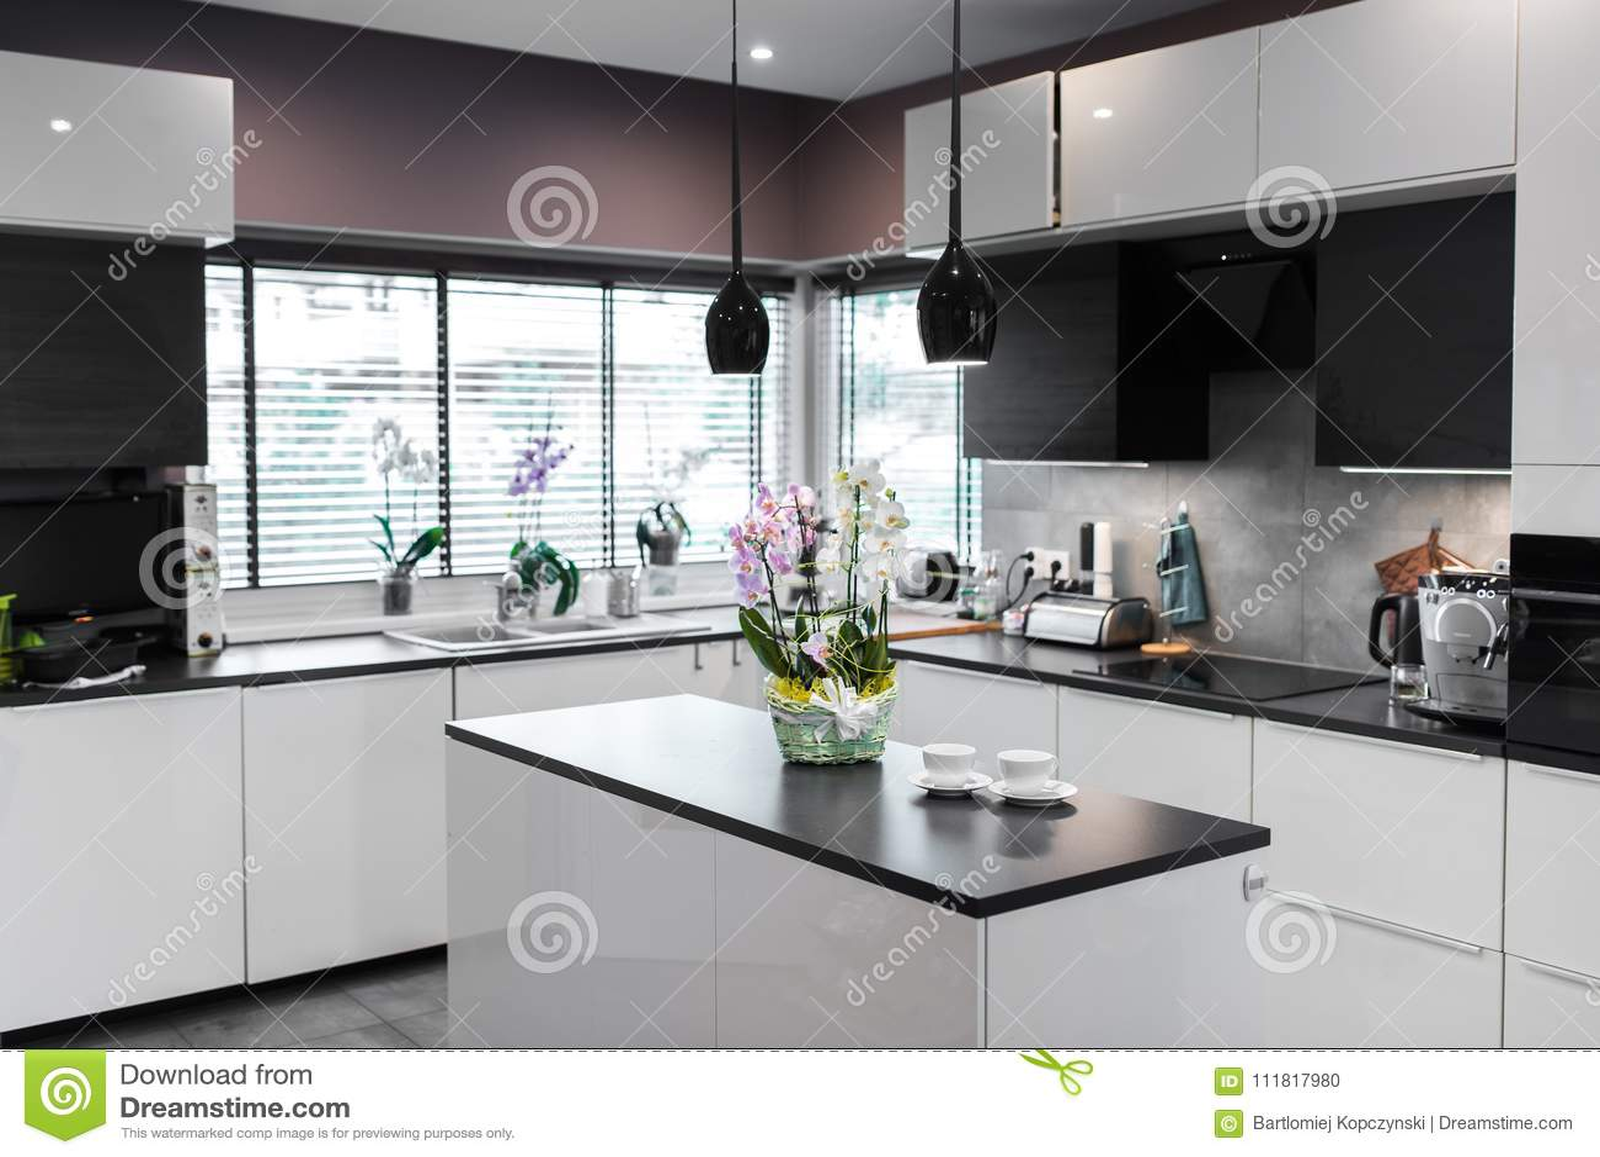 kitchen decor yellow 4 hole faucet 白黄色兰花在厨房里库存照片 图片包括有新鲜 纸张 装饰 玻璃 独有 白黄色兰花在厨房里